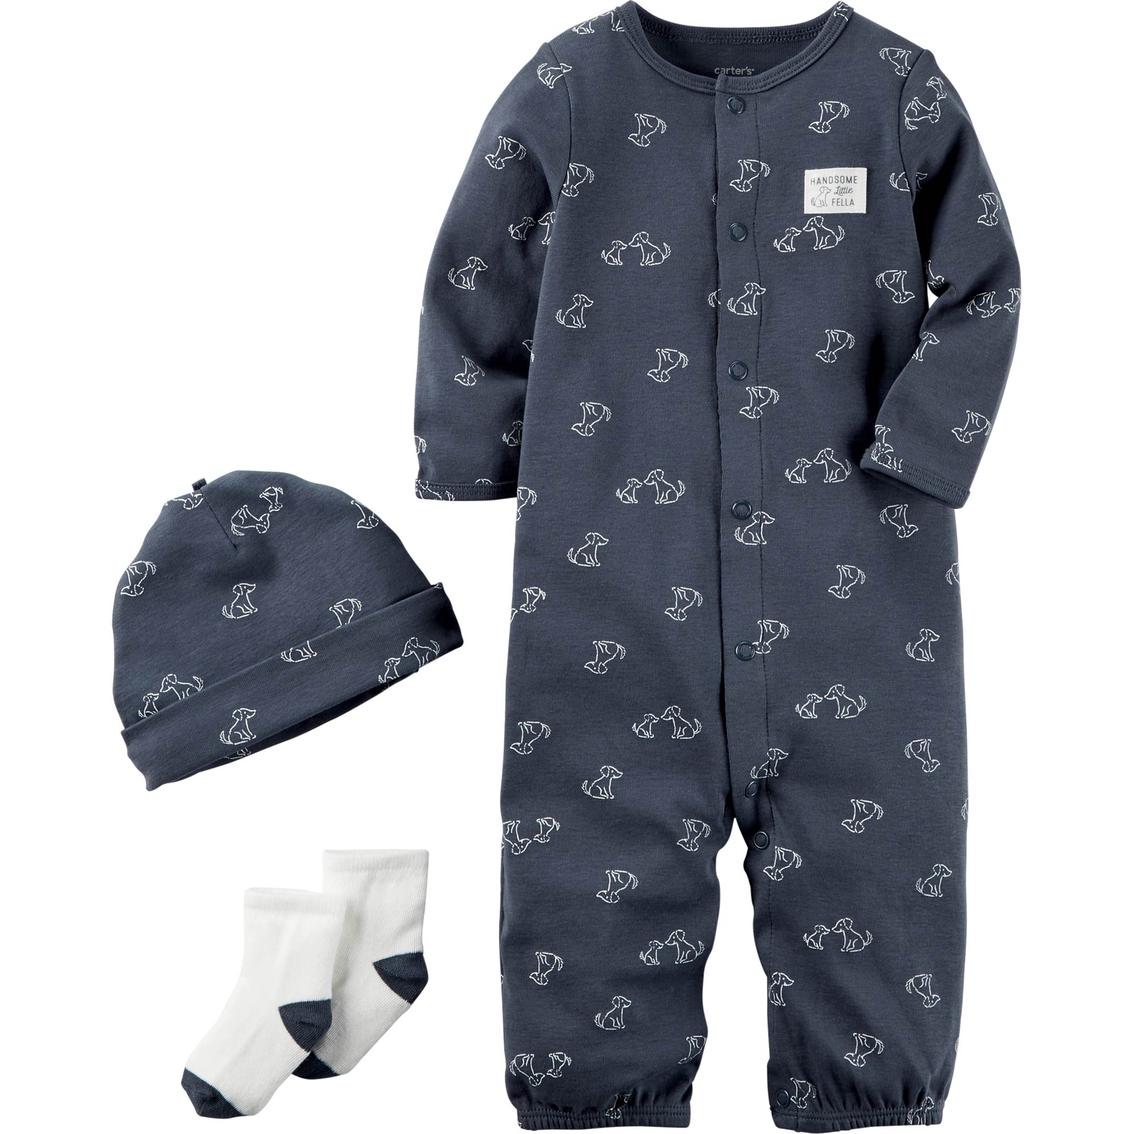 aca05aaa9743 Carter s Infant Boys 3 Pc. Babysoft Take Me Home Set